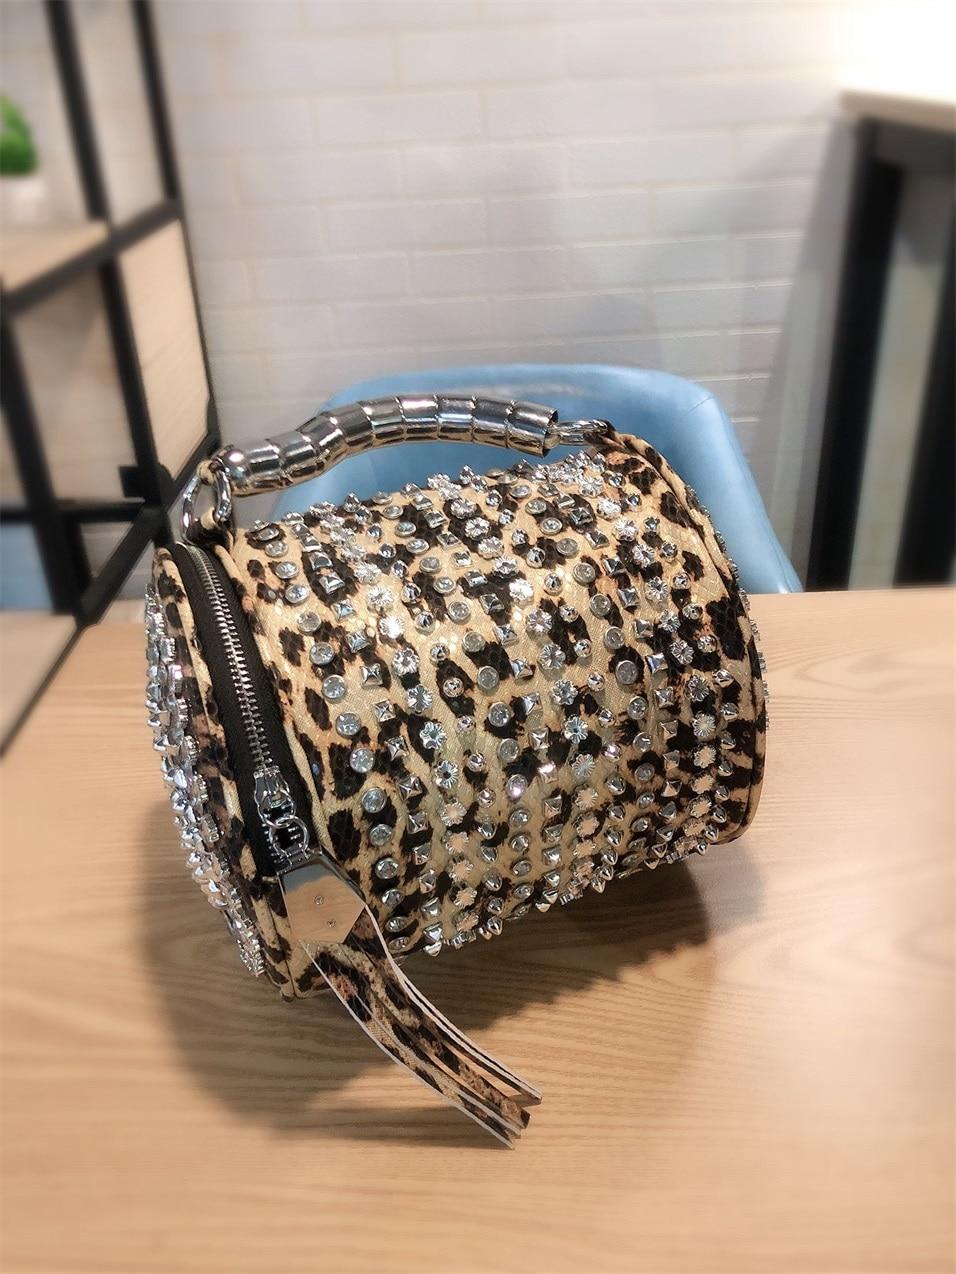 2019 Fashion Rhinestone Women Bucket Bag Vintage Tassel Messenger Bag High Quality Retro Shoulder Bag Simple Crossbody Bag Tote